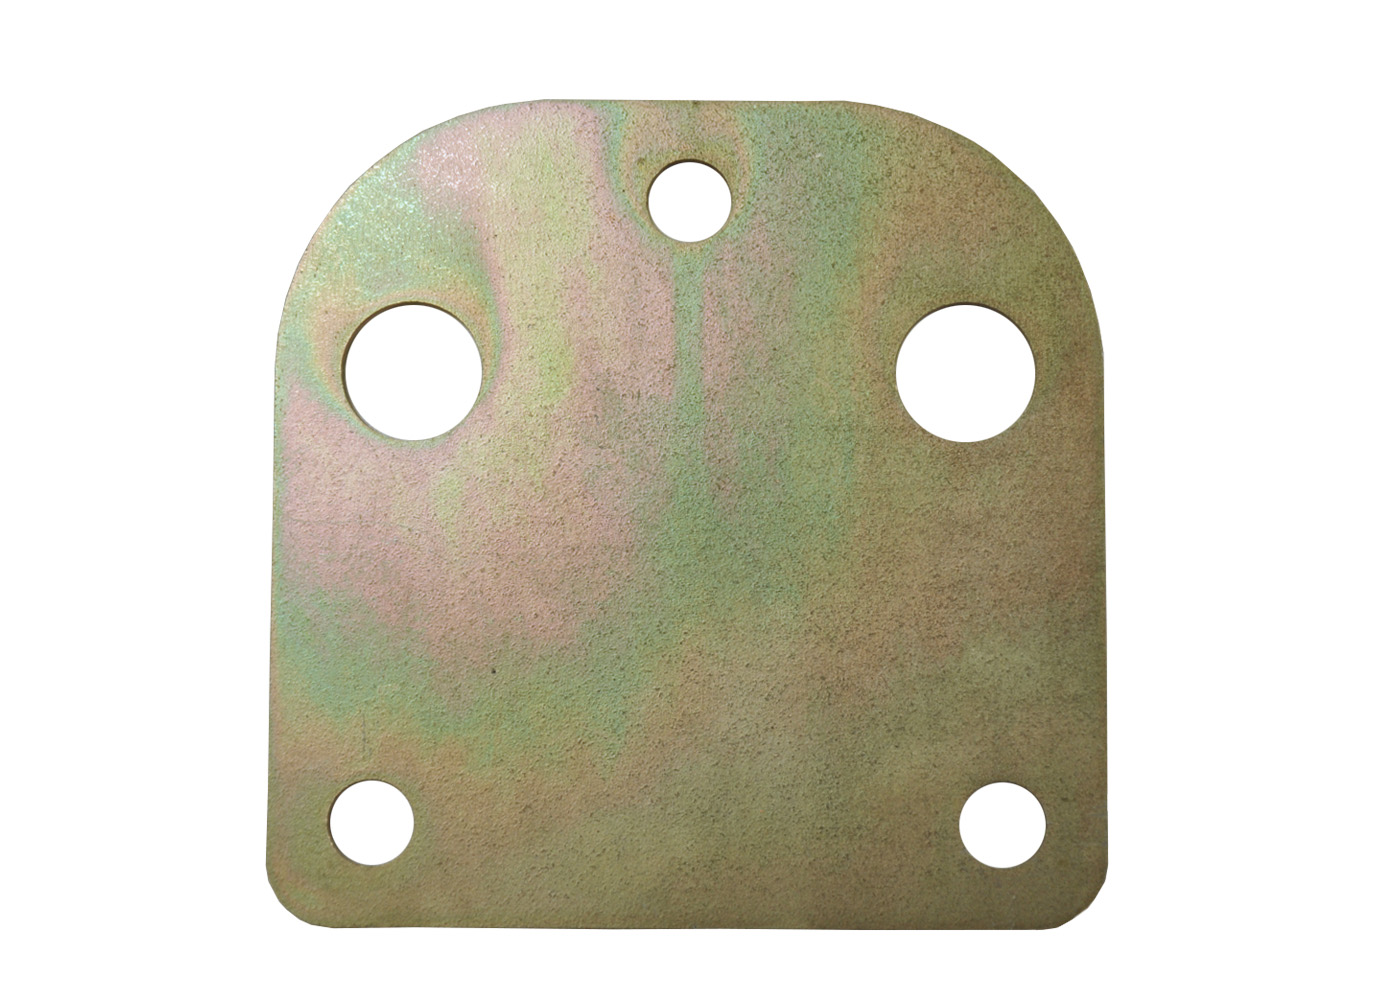 A19393-drop-pin-plate-1400w